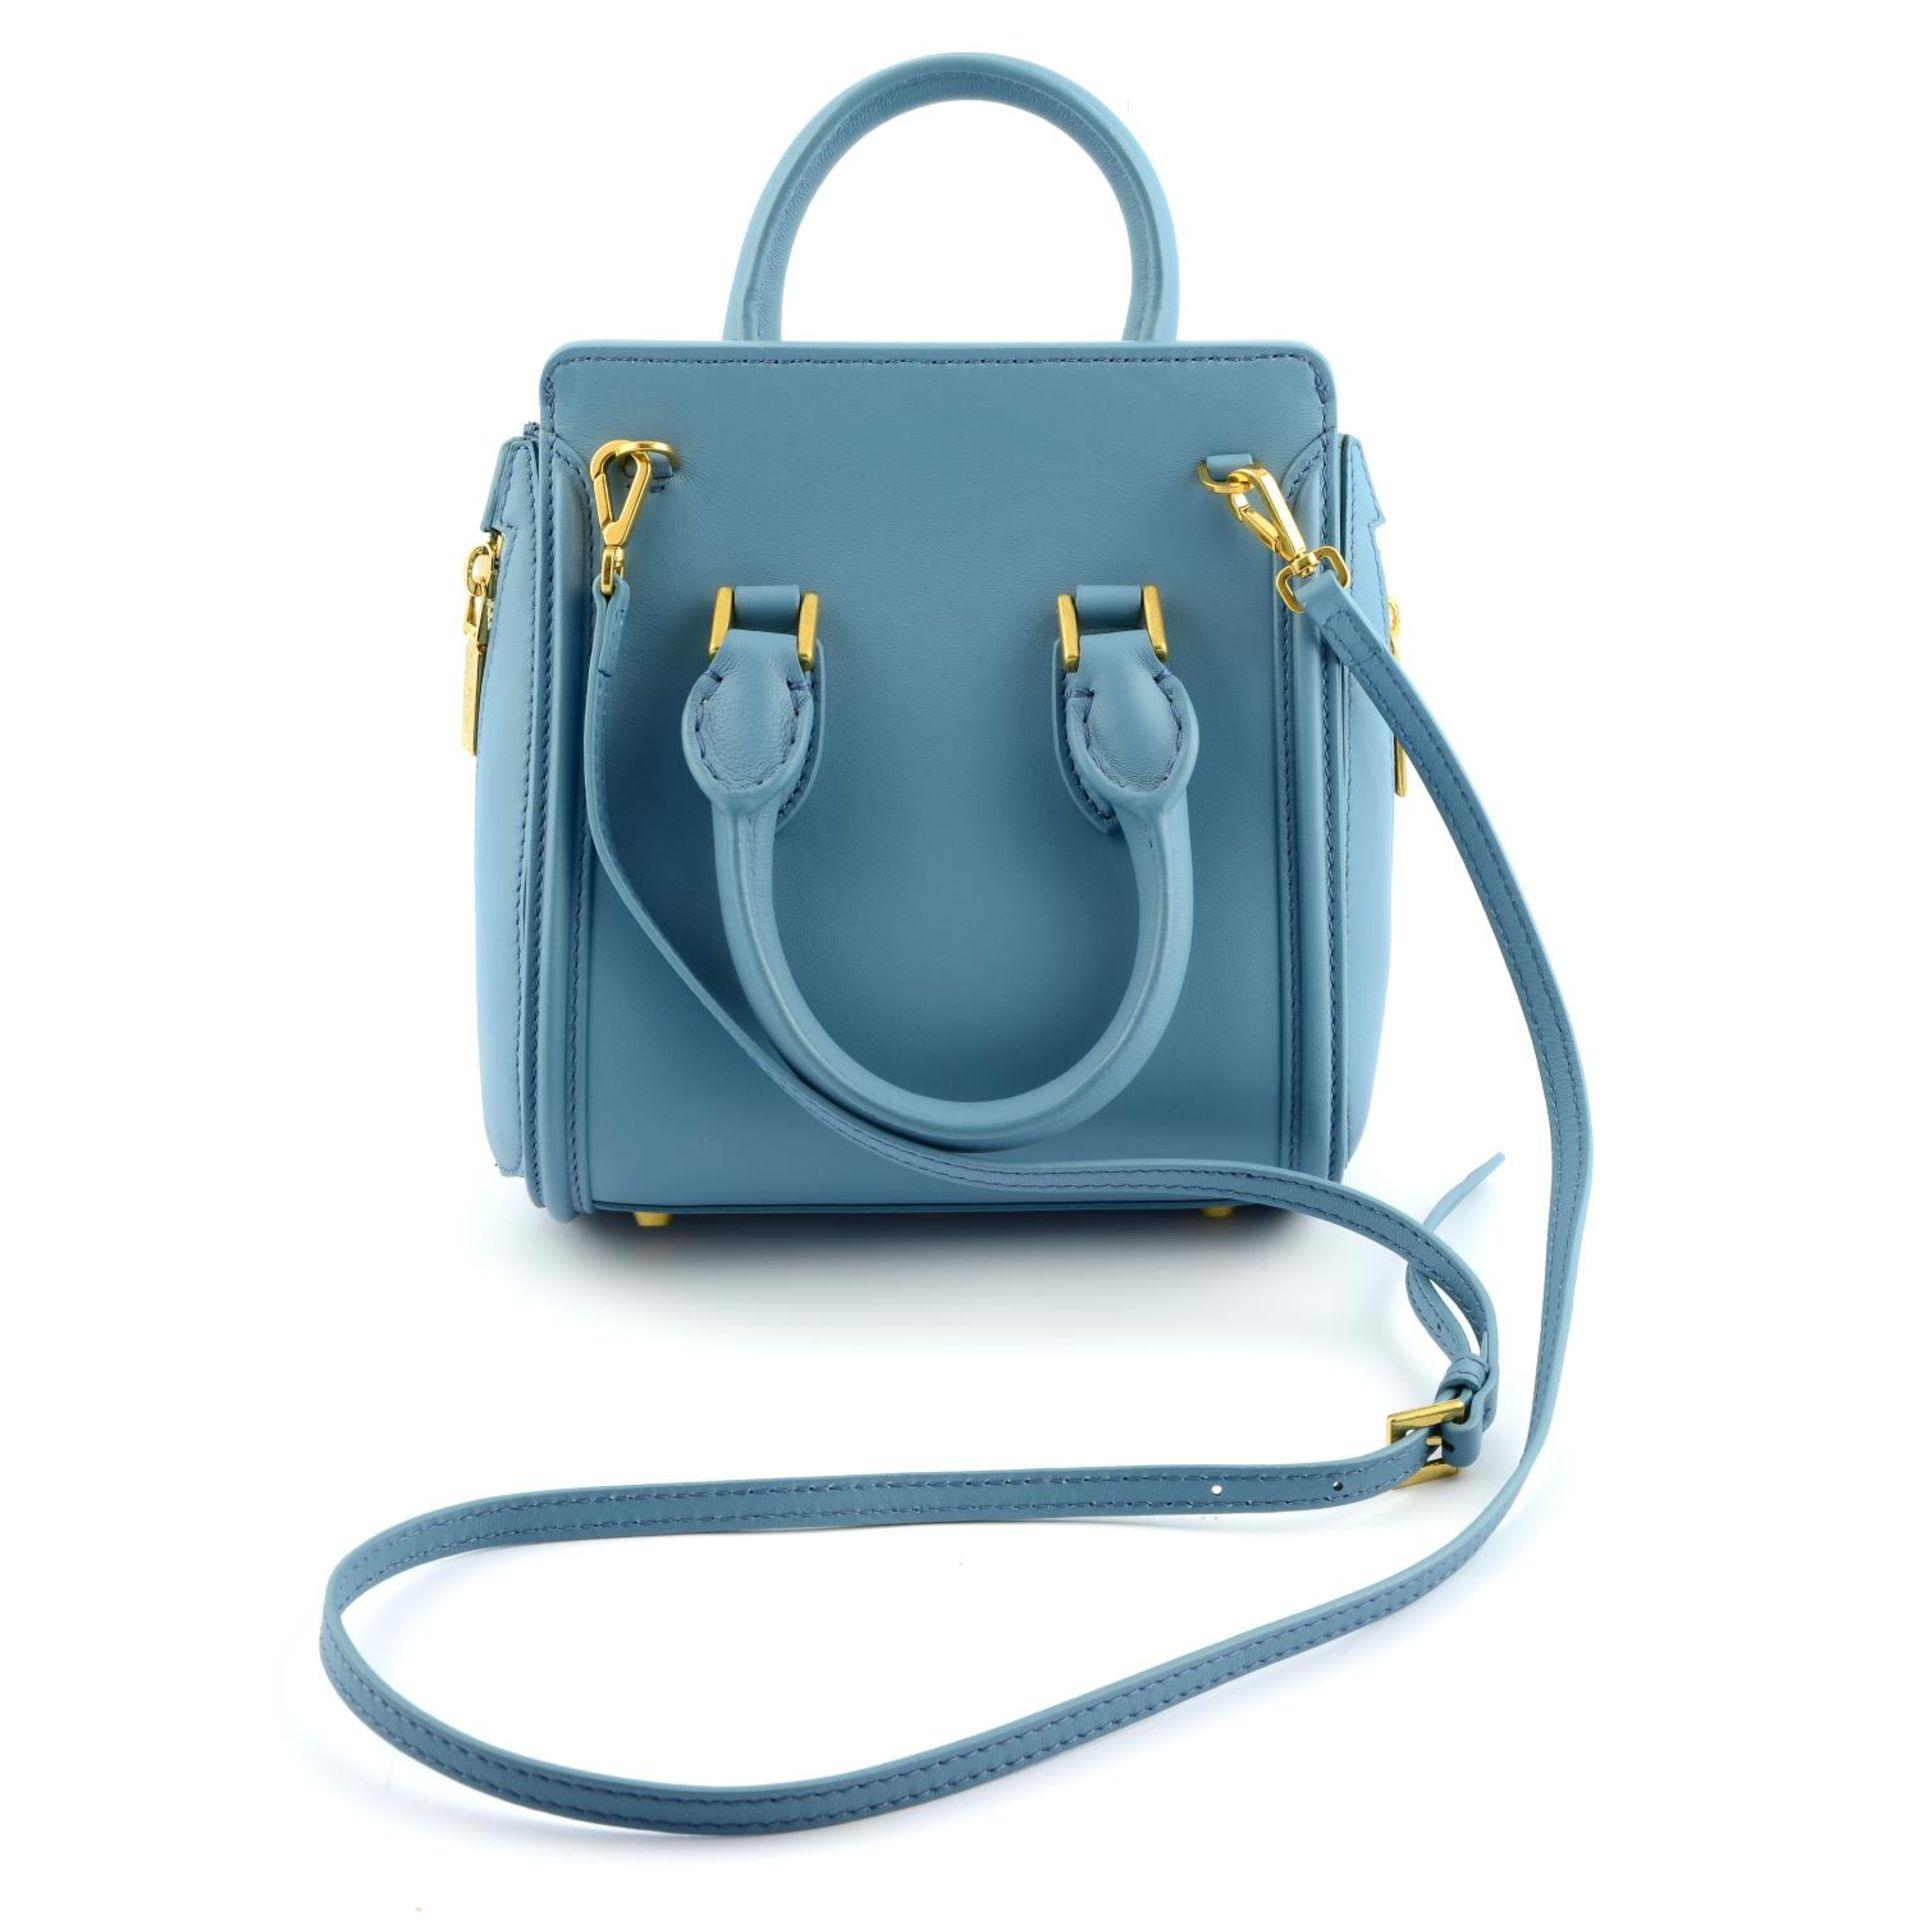 ALEXANDER MCQUEEN - a blue embellished mini Heroine handbag. - Image 2 of 6